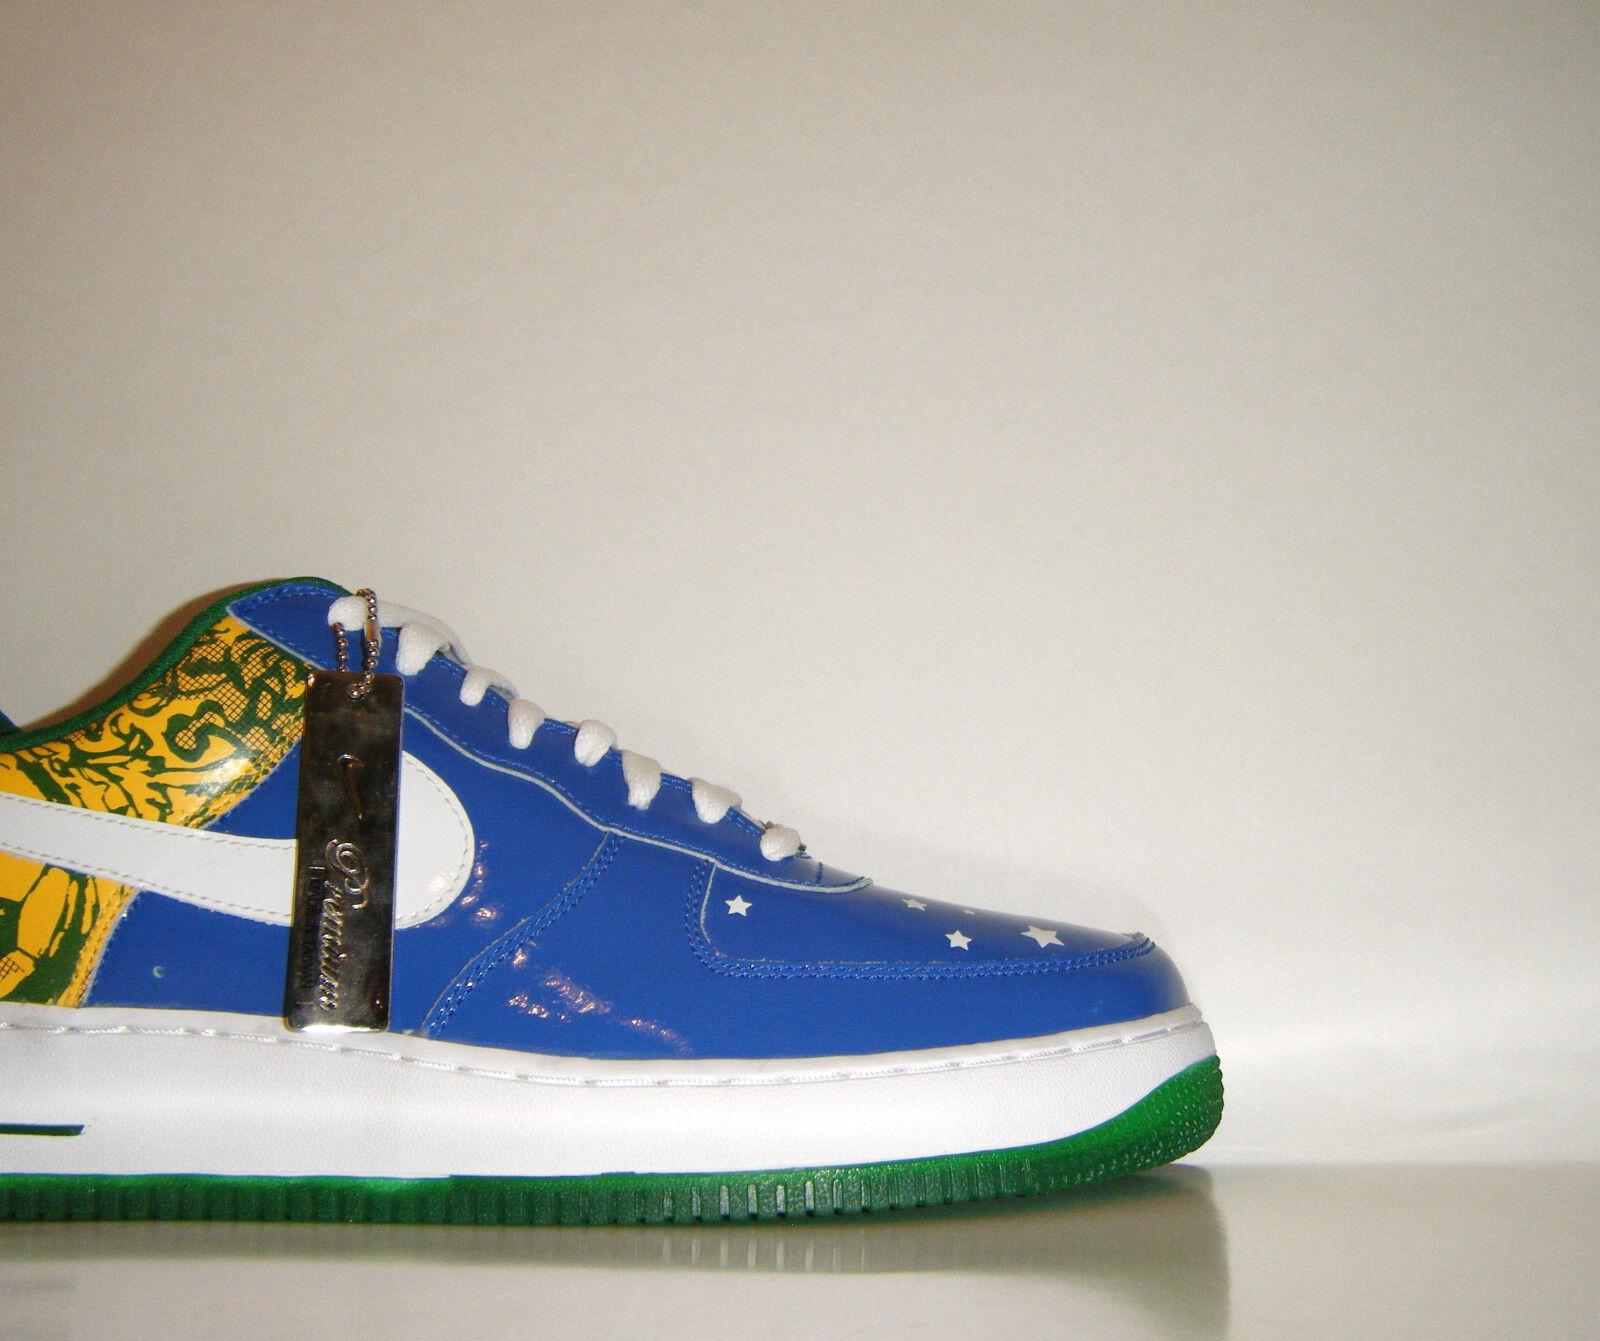 2006 Nike Premium Air Force 1 Low Premium Nike Ronaldinho Brazil QS 12 World Cup Rio Olympics 07143d